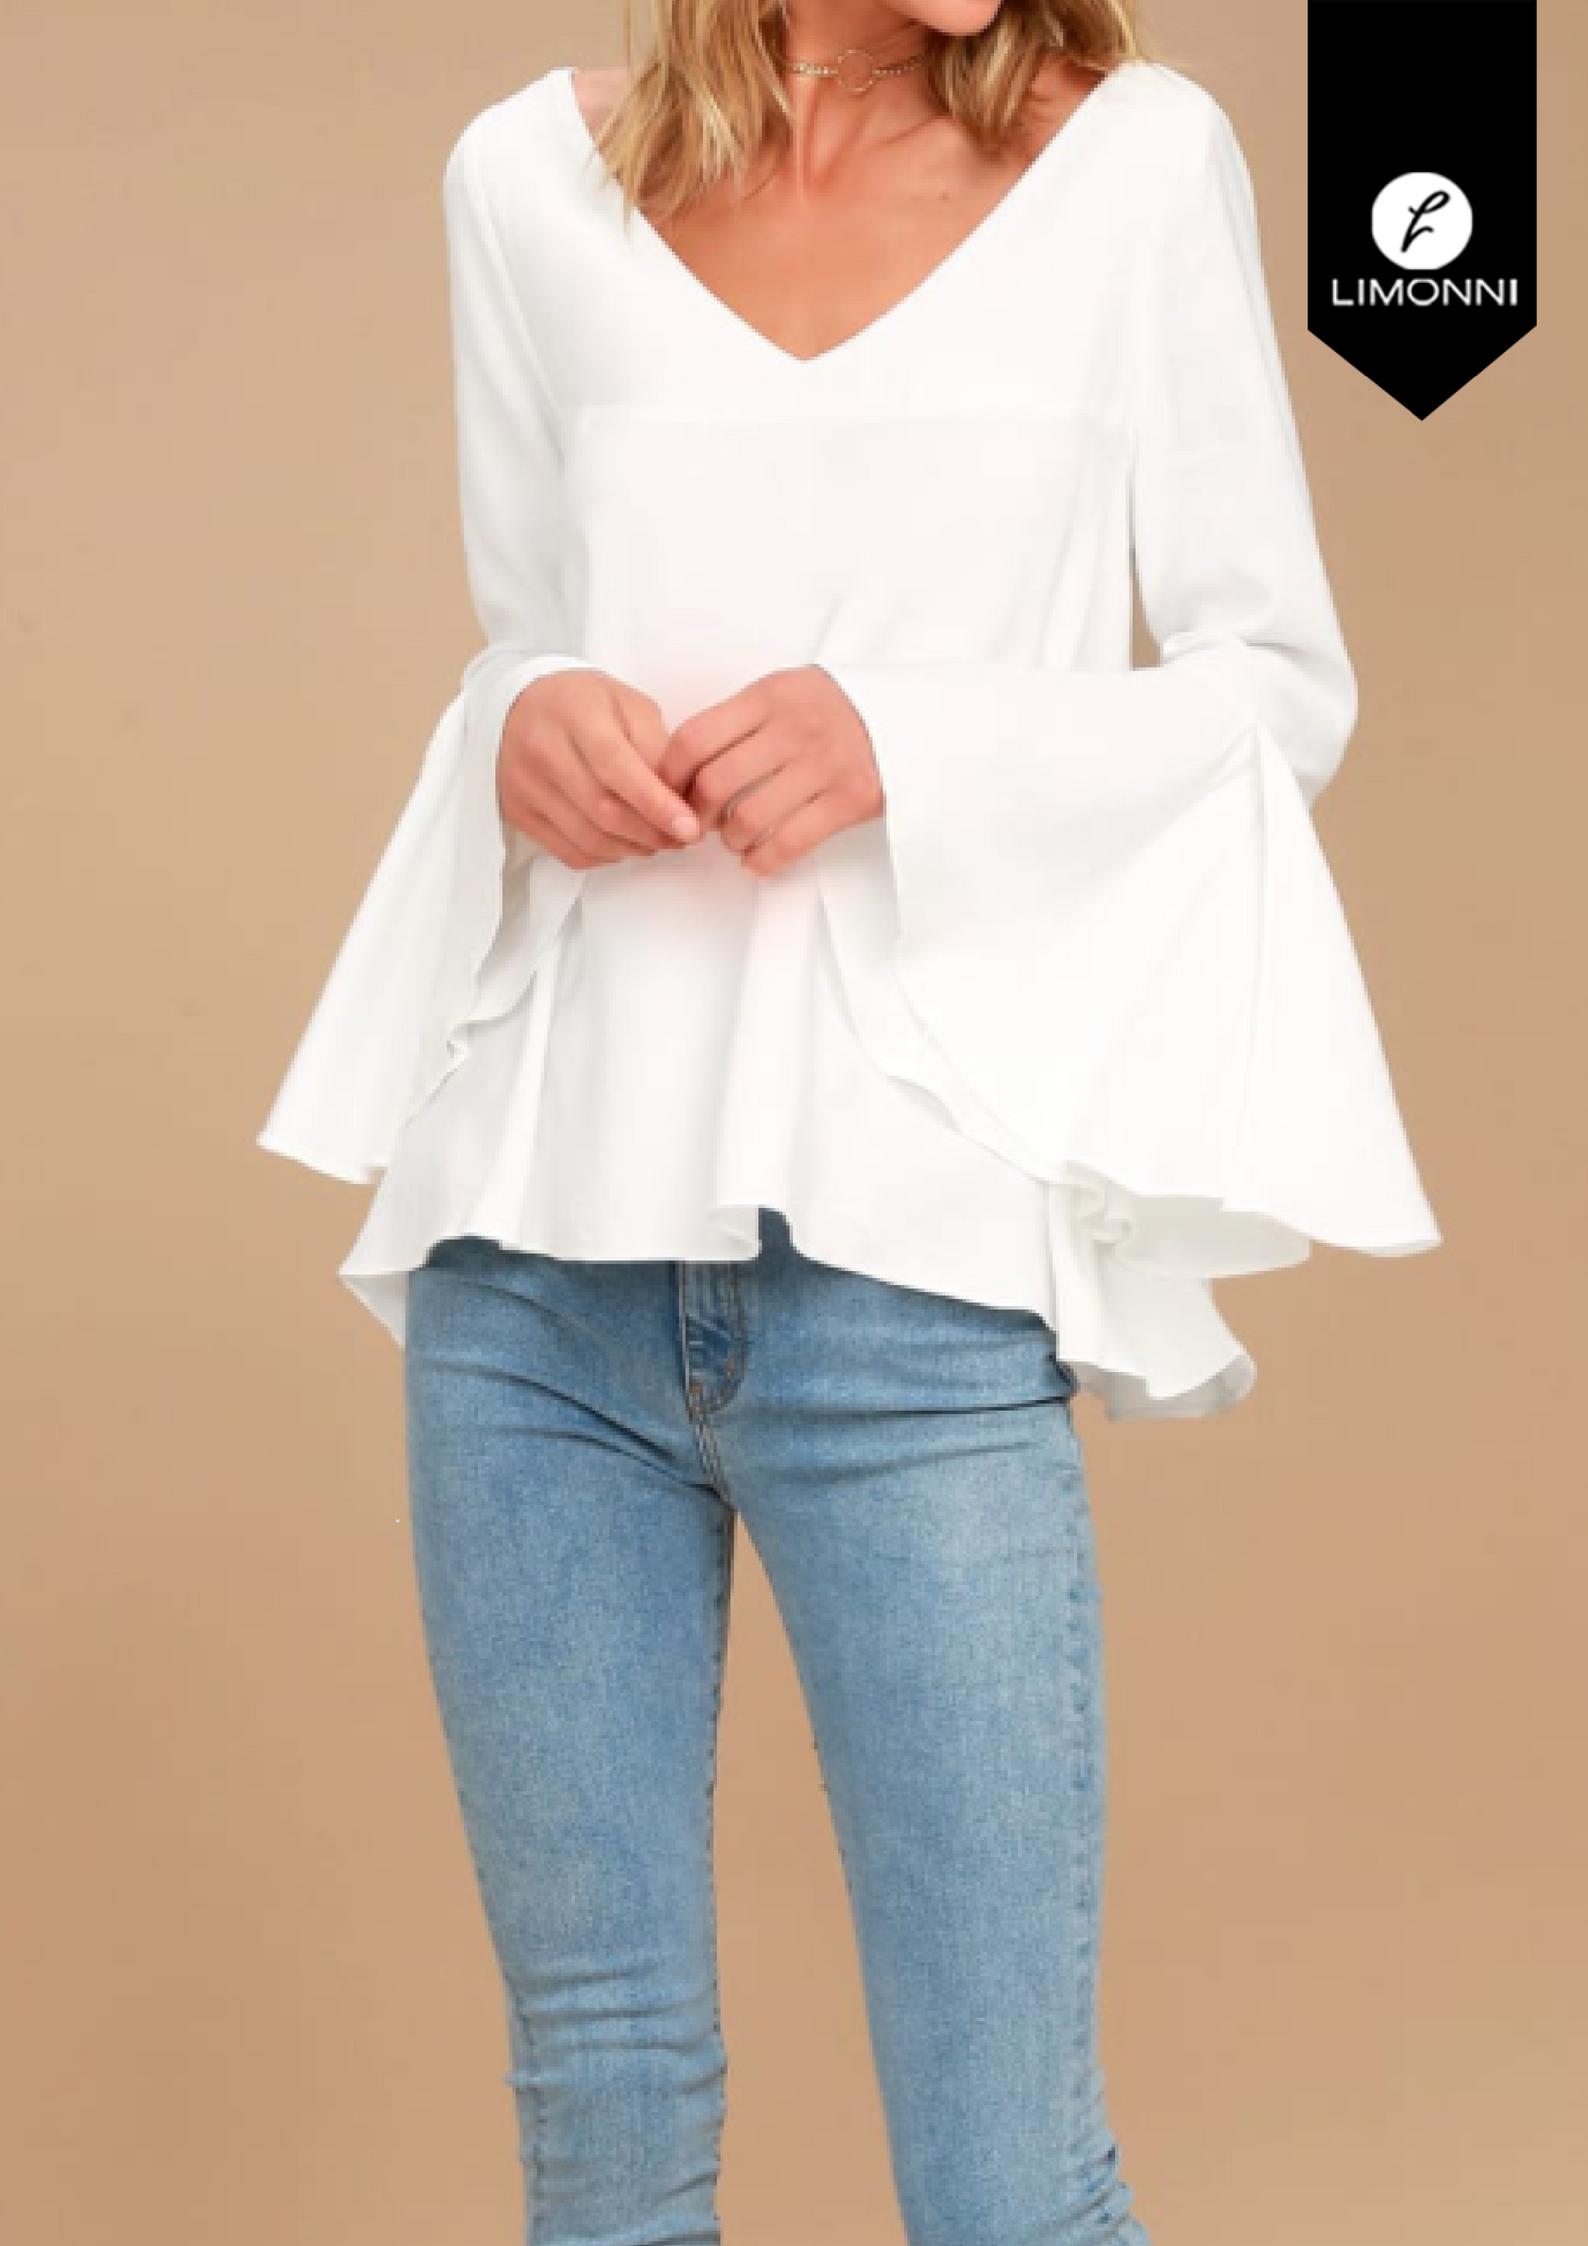 Blusas para mujer Limonni Bennett LI1386 Casuales